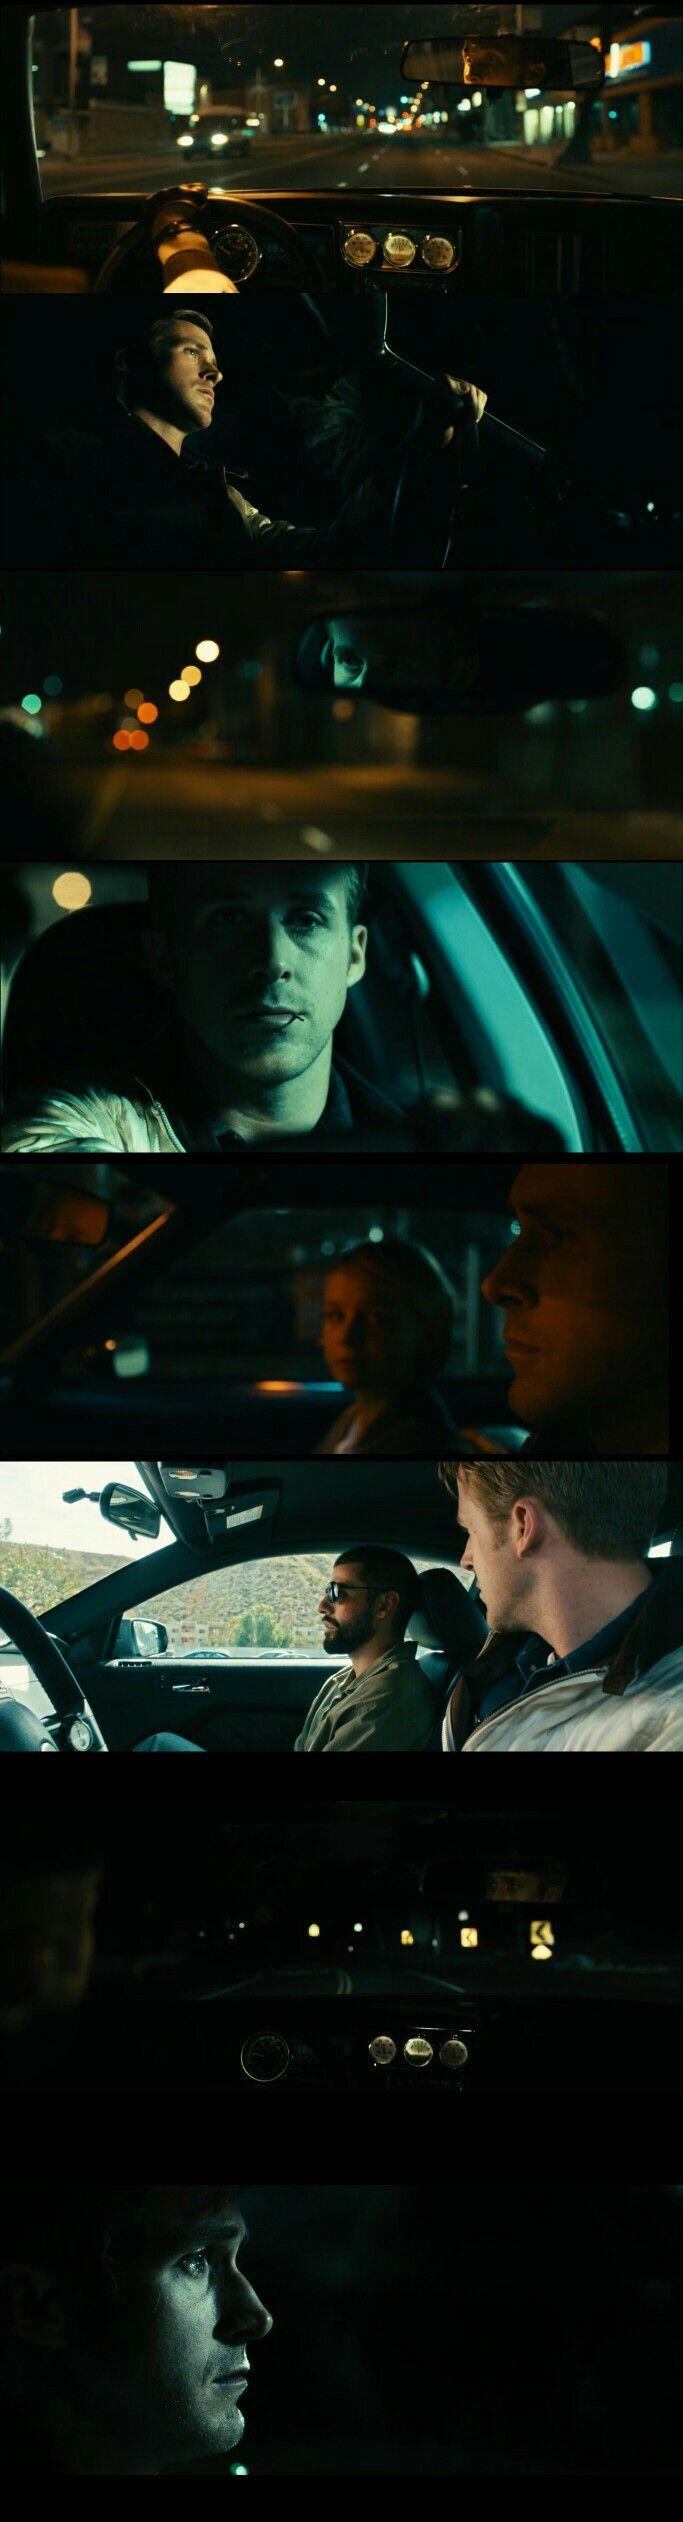 Drive(2011) Directed by Nicolas Winding Refn.